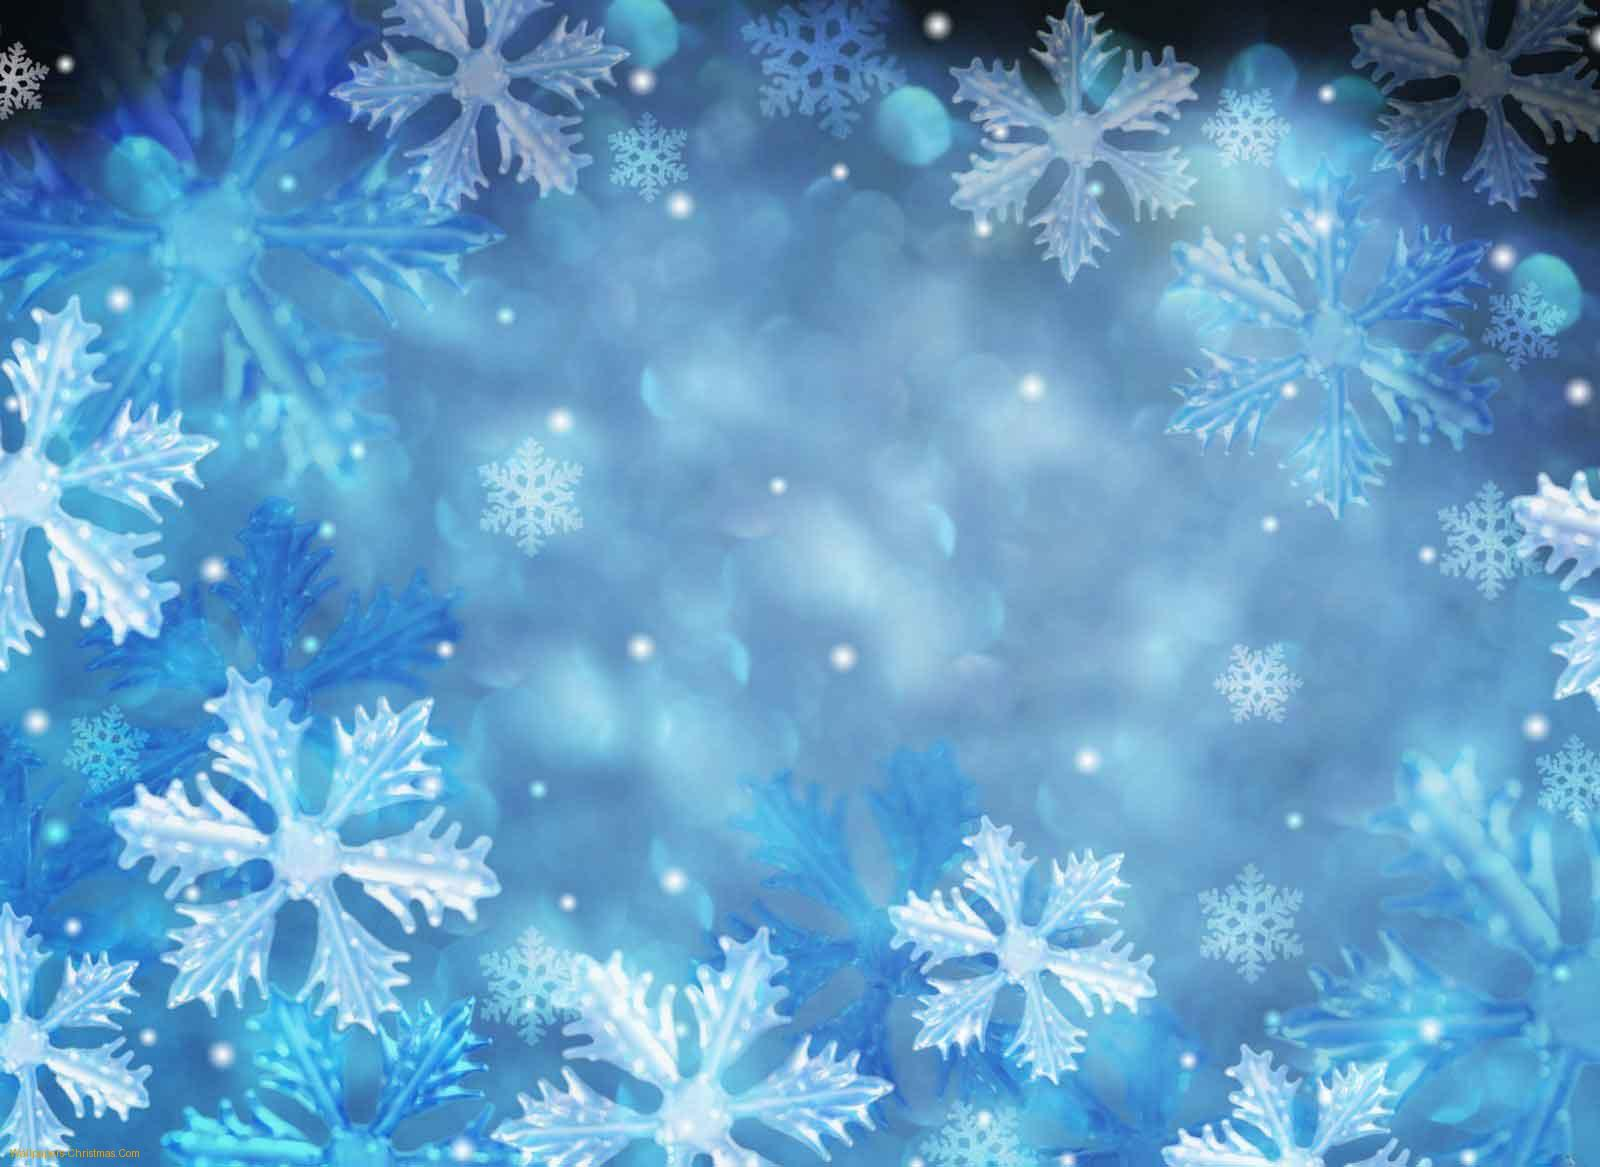 Snow Backgrounds and Wallpaper WallpaperSafari